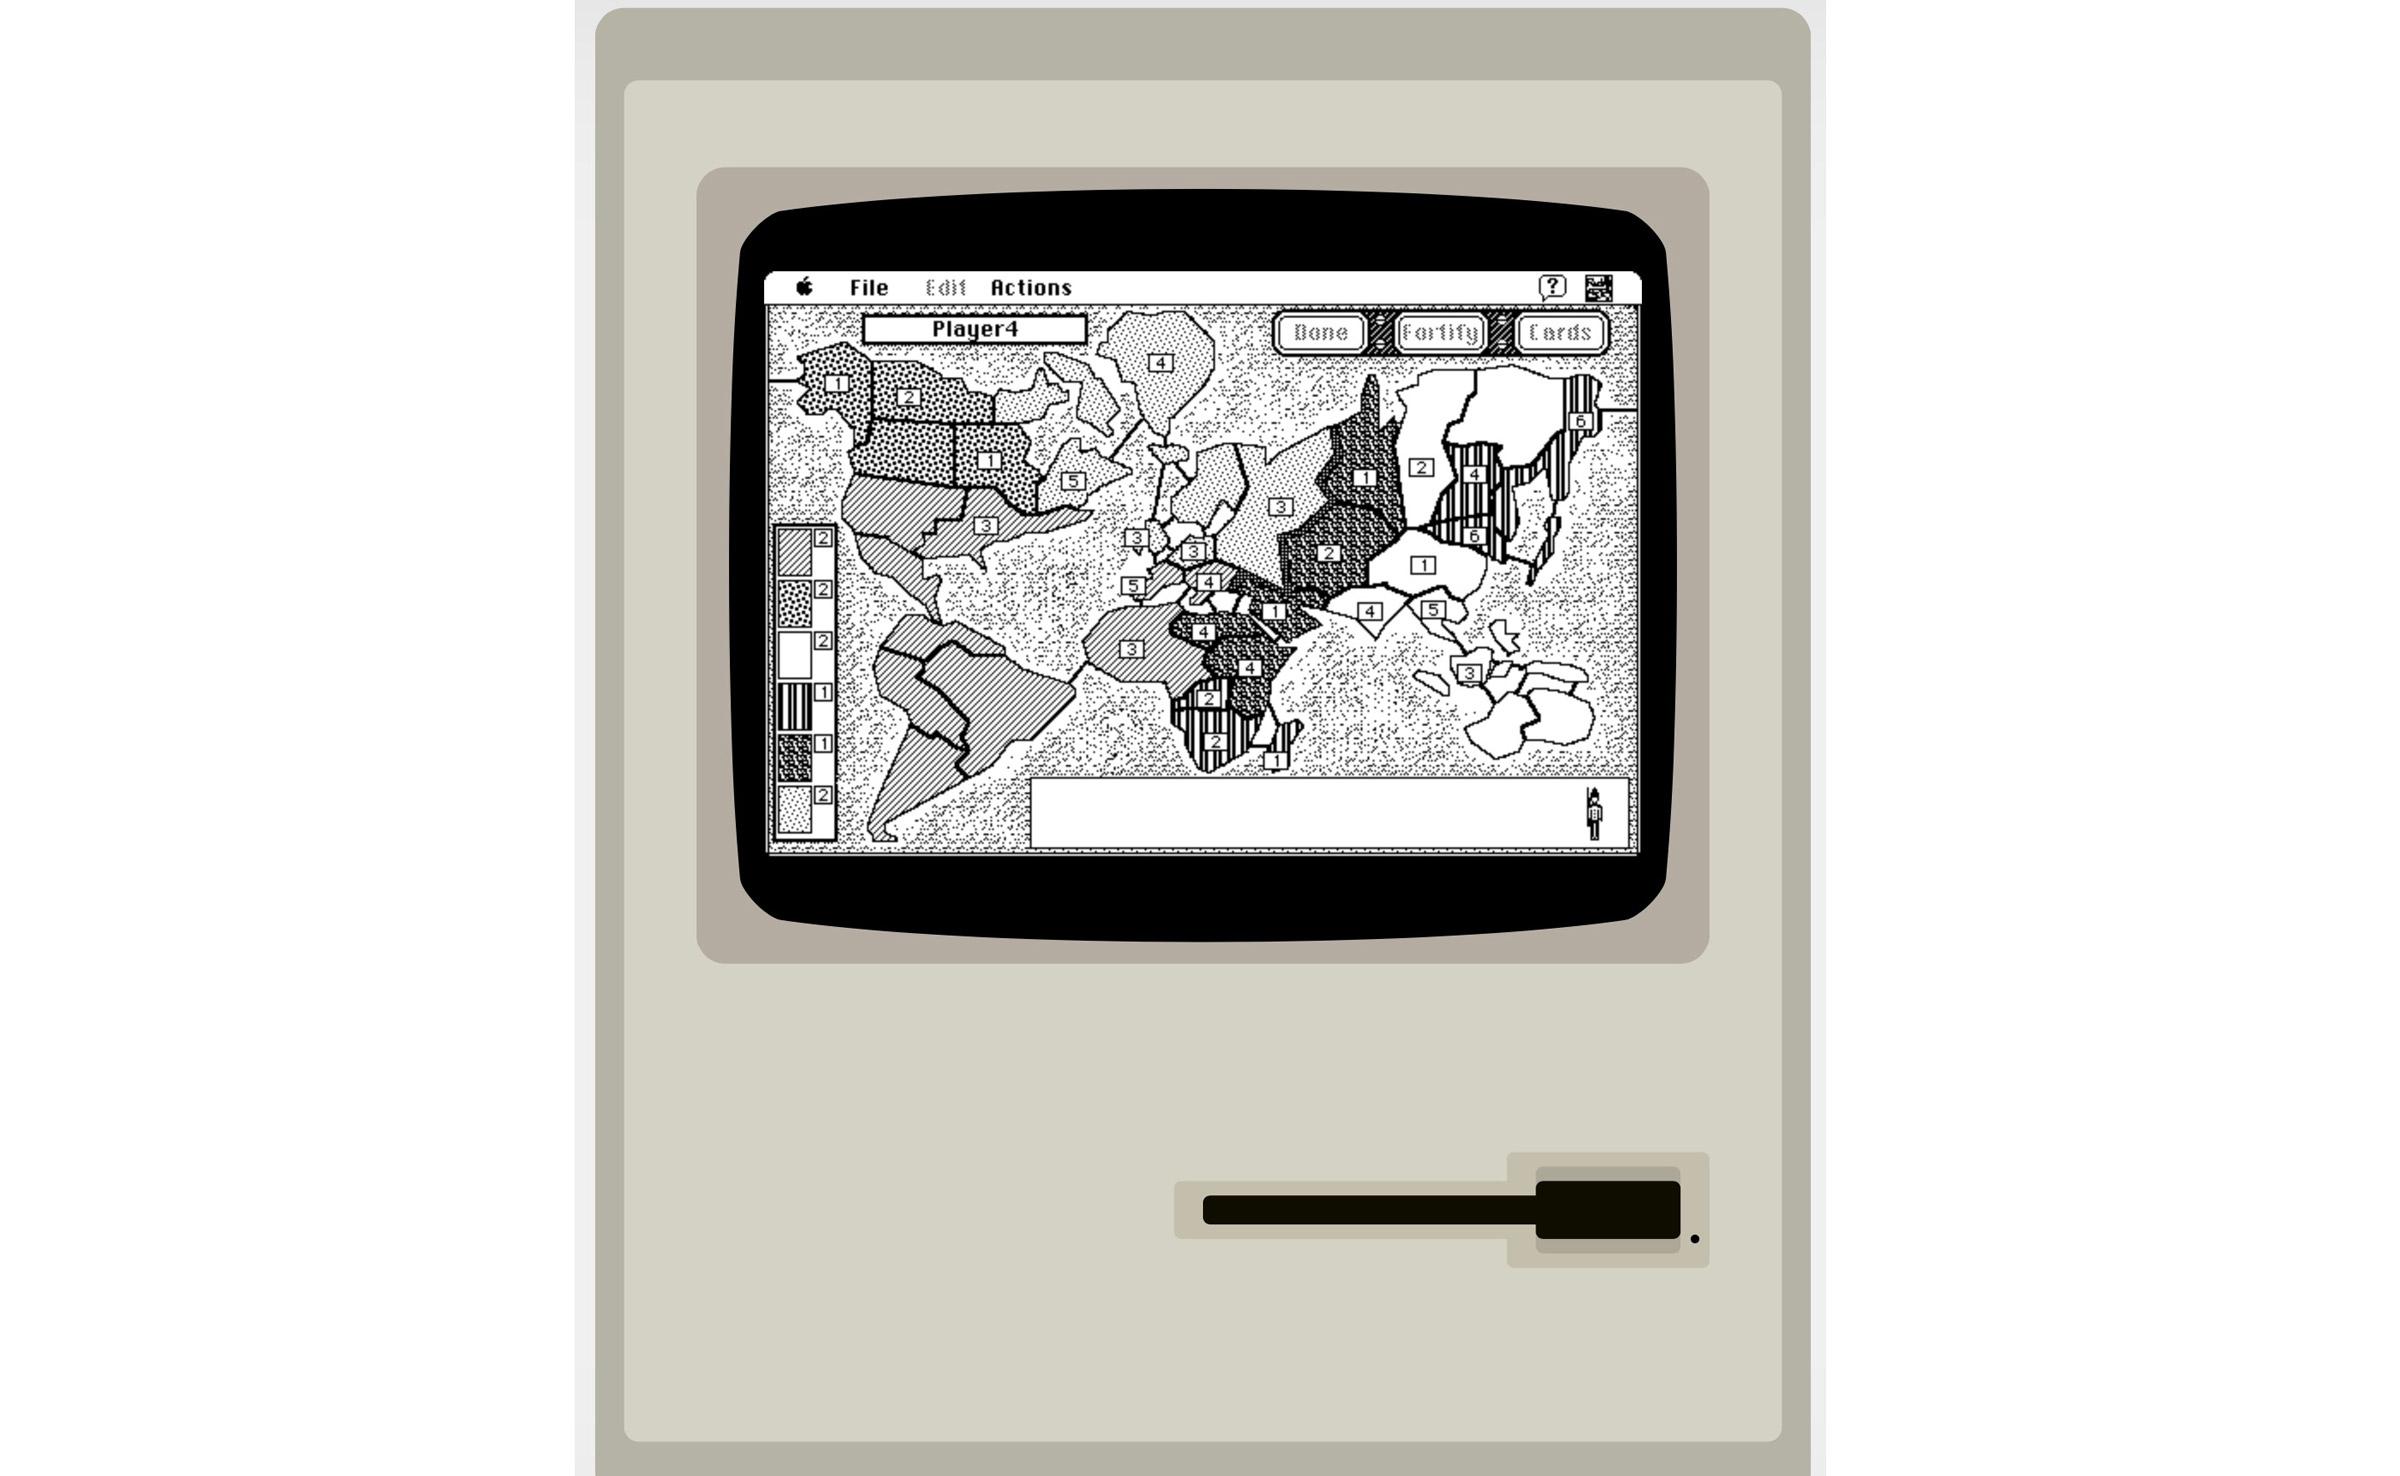 Play Risk and Oregon Trailer on MacPlus System 7 Emulator